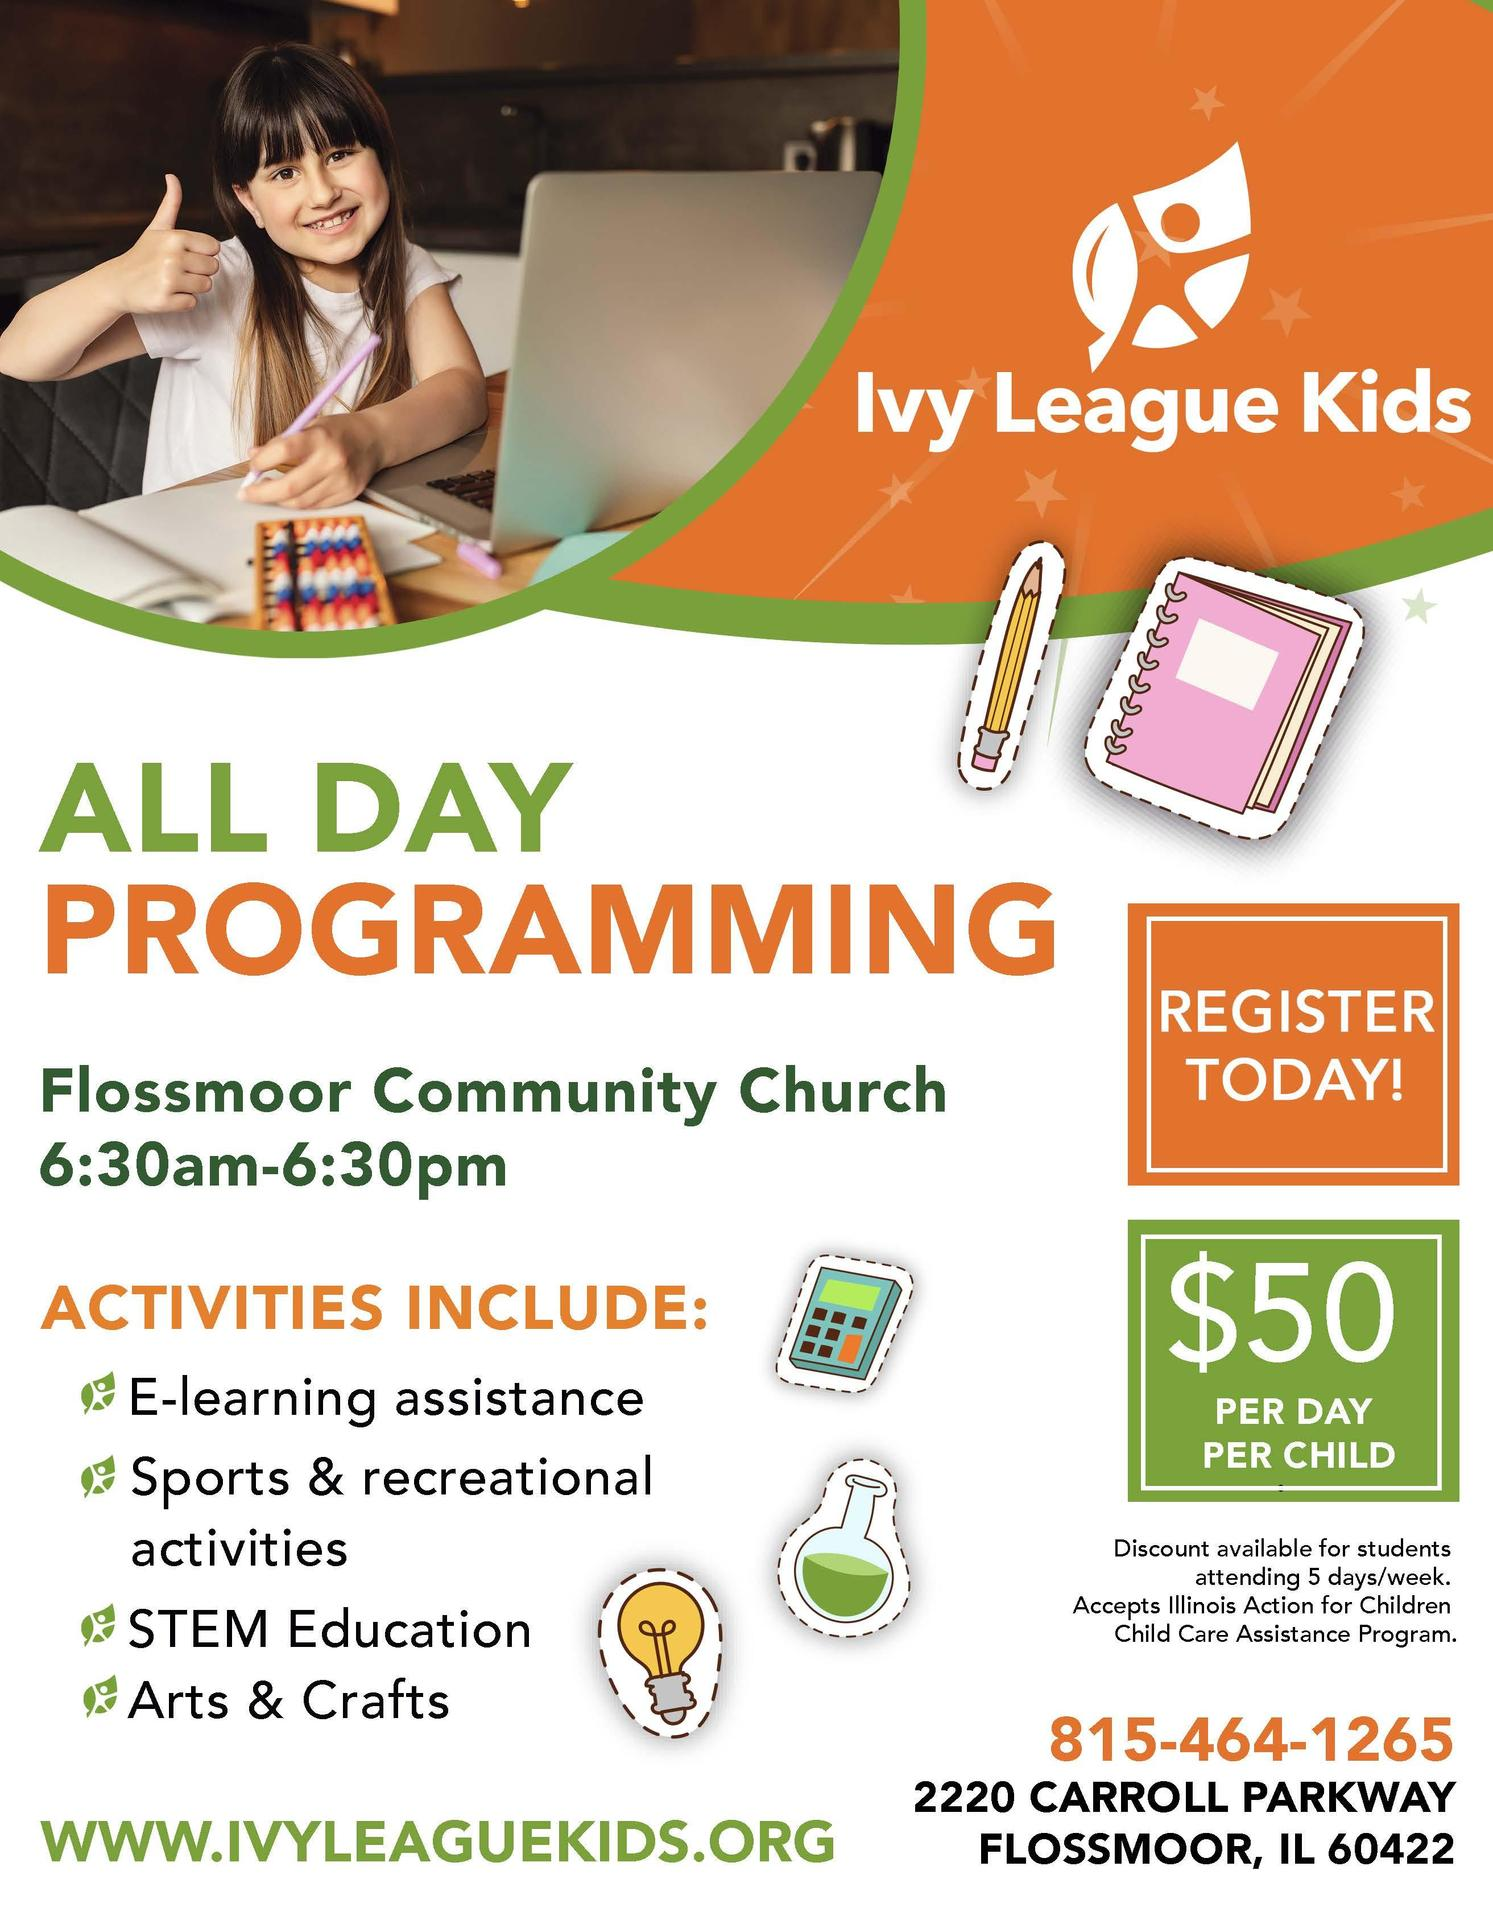 Ivy League Kids all day program